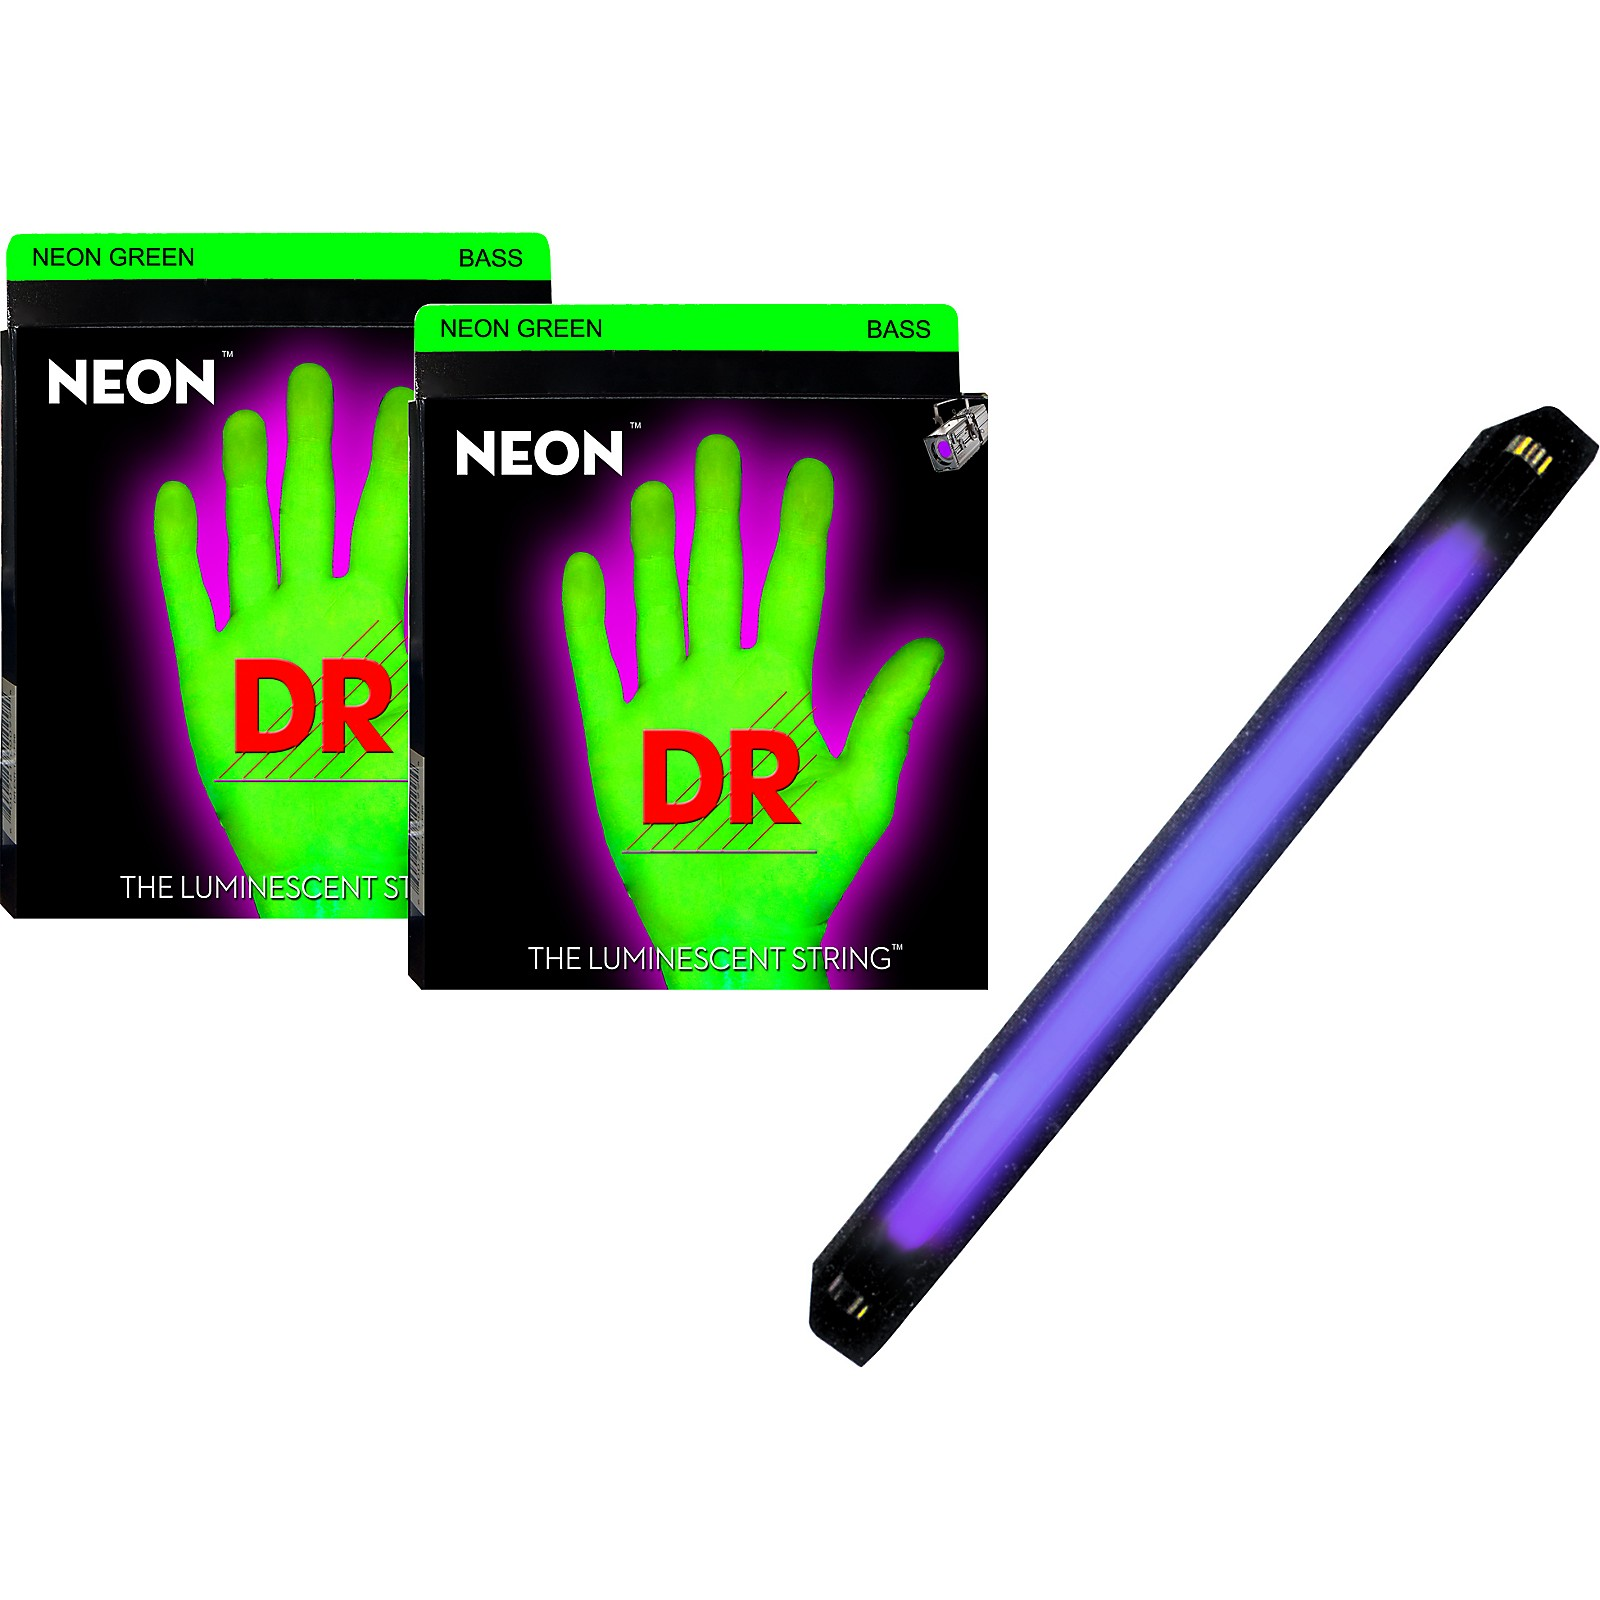 DR Strings Neon Phosphorescent Green Medium 5 String Bass Strings with Free American DJ Super Black Light